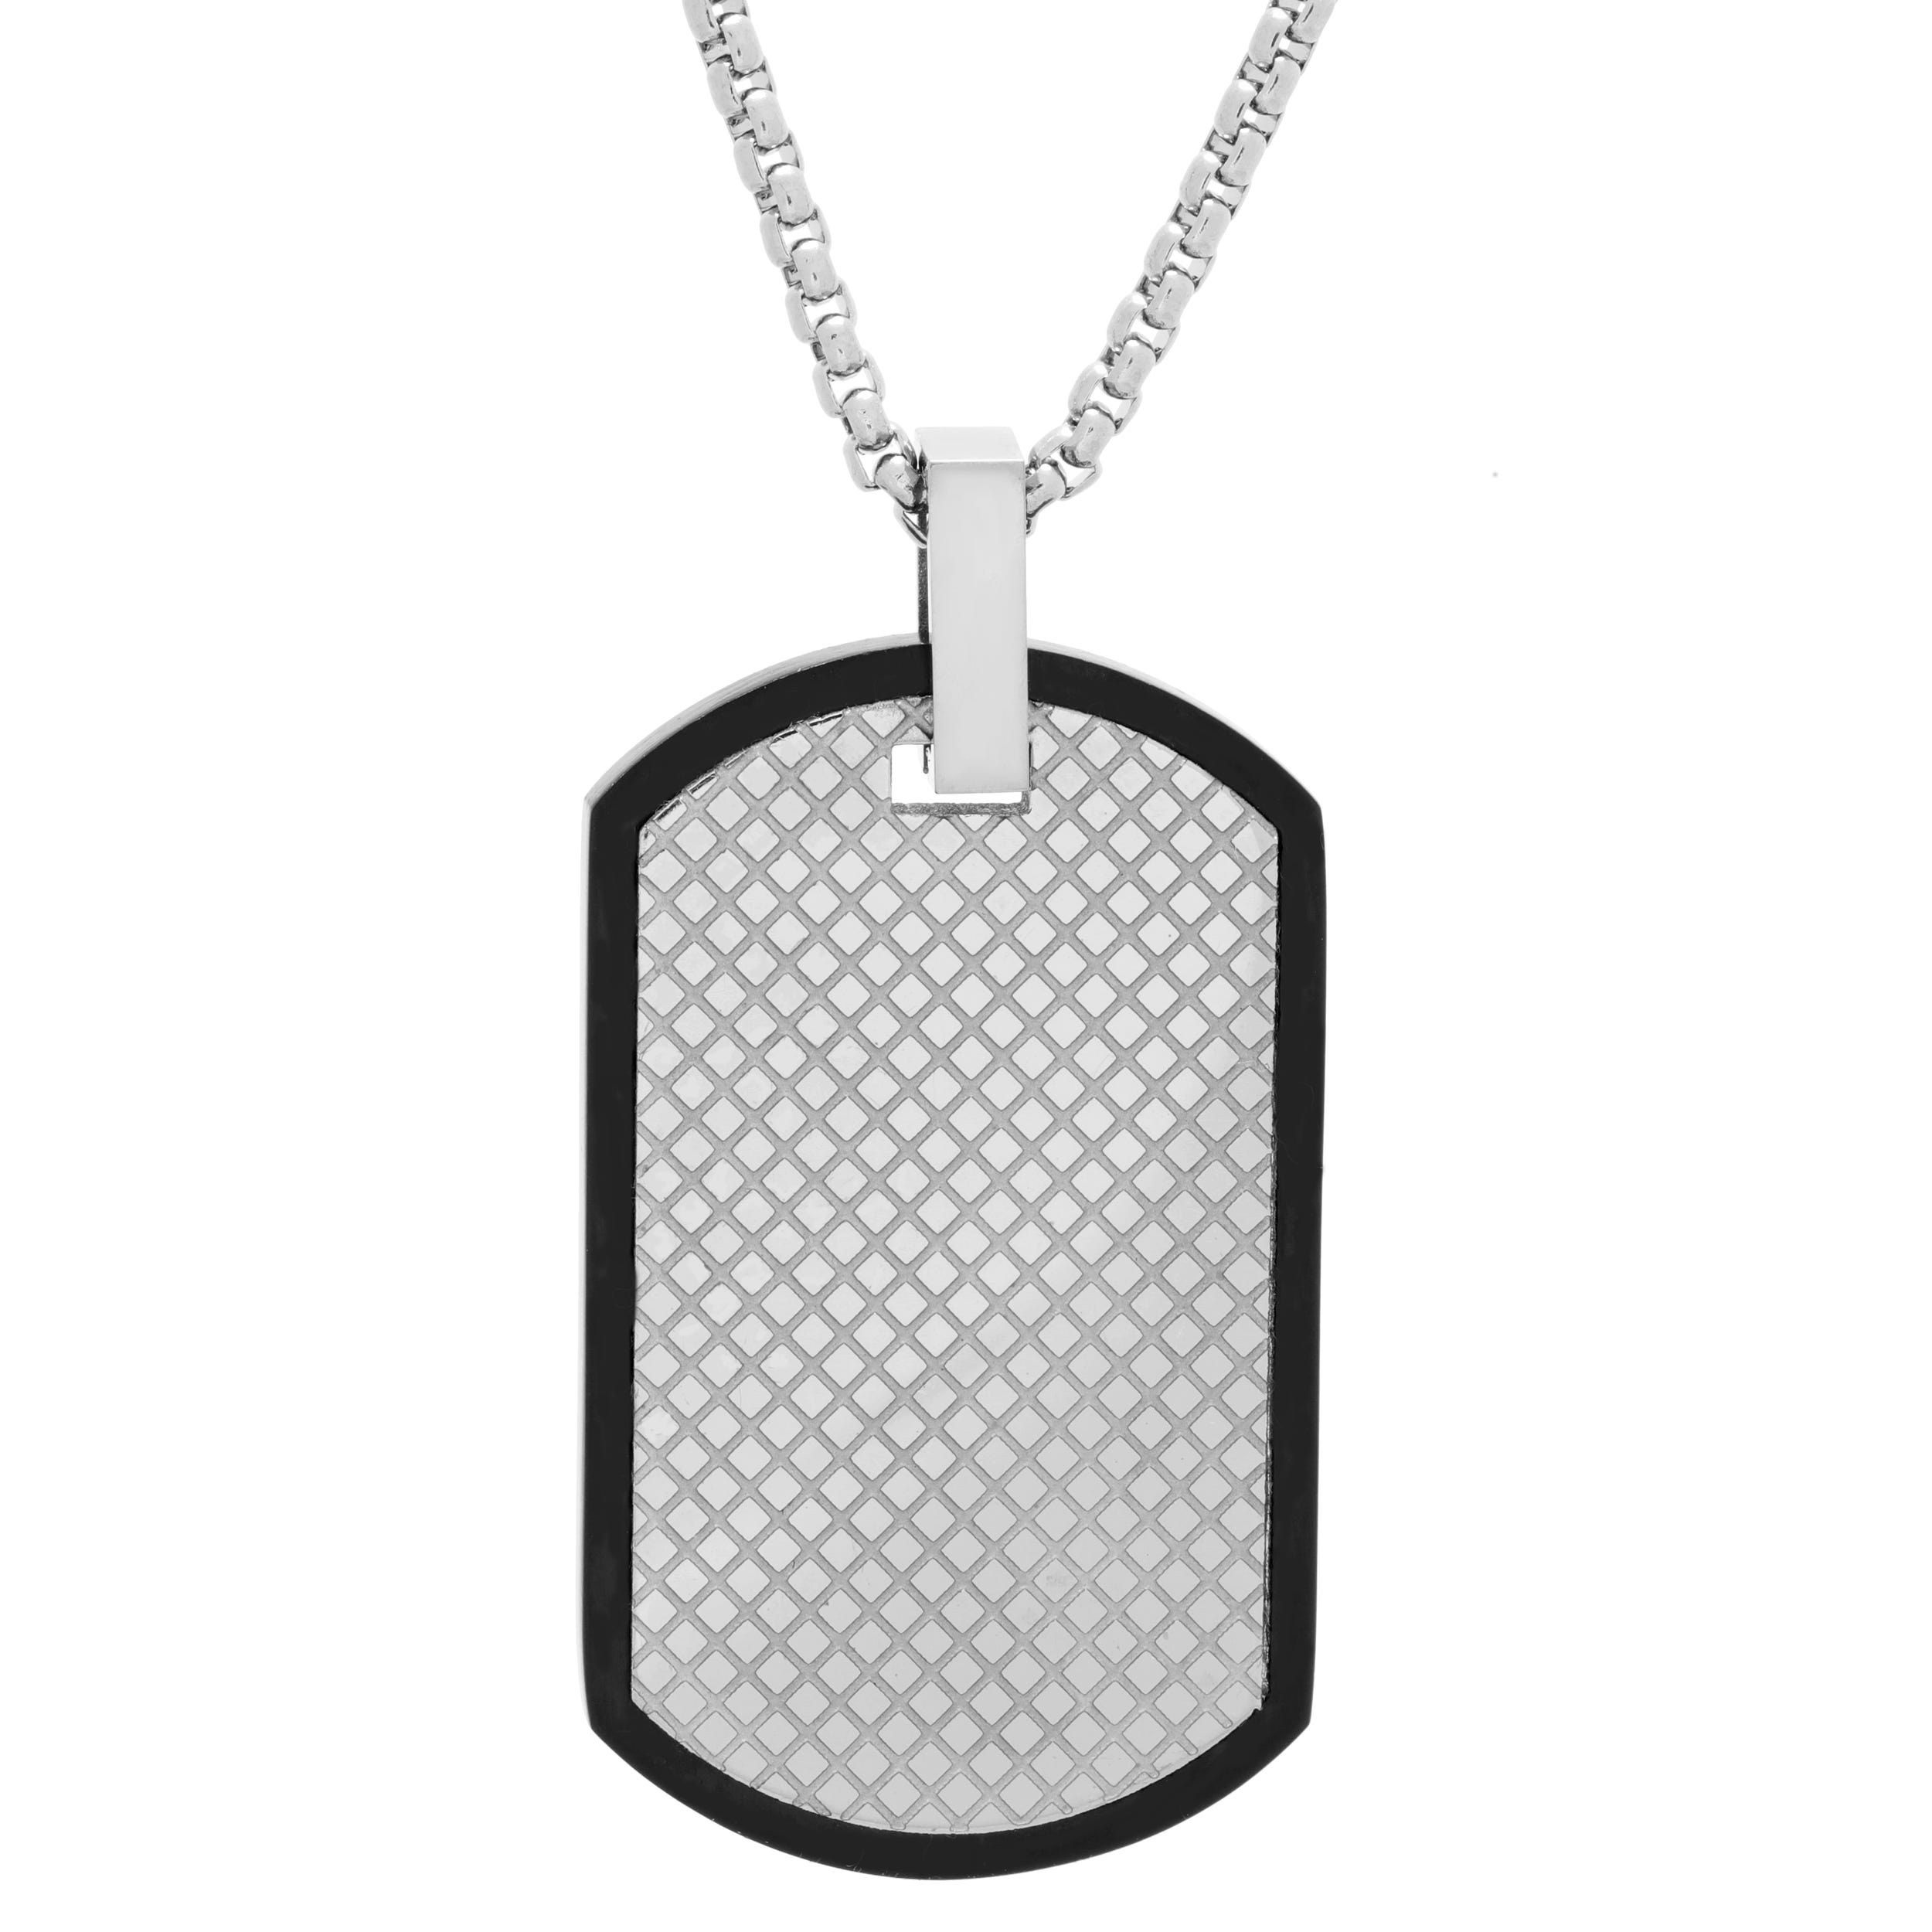 Men's Stainless Steel Black Border Dog Tag Necklace